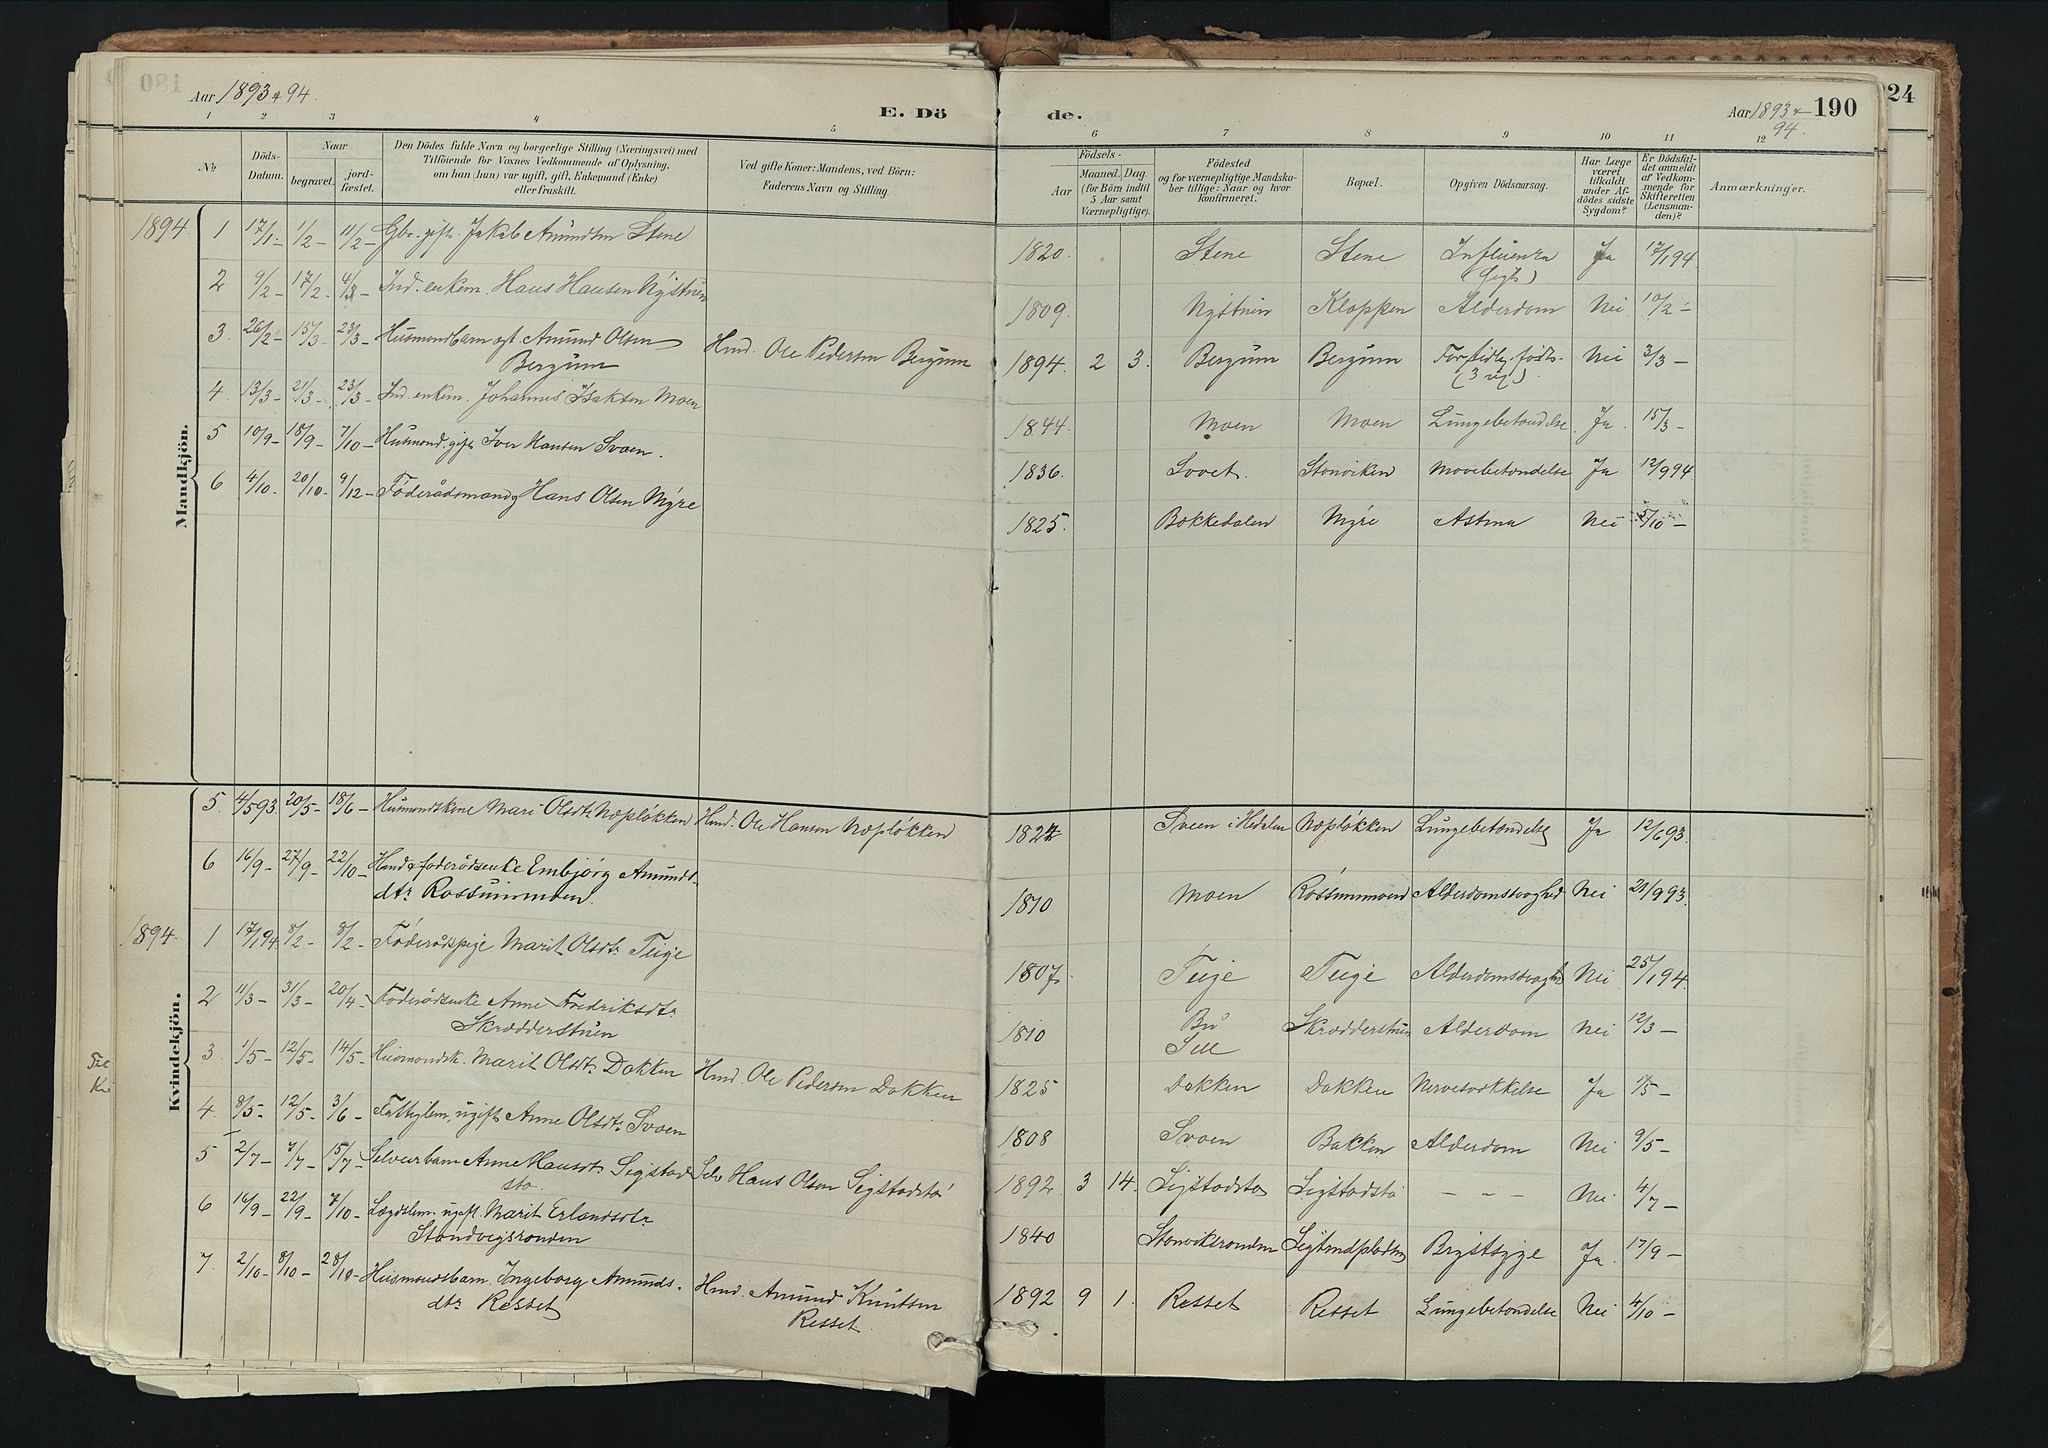 SAH, Nord-Fron prestekontor, Ministerialbok nr. 3, 1884-1914, s. 190